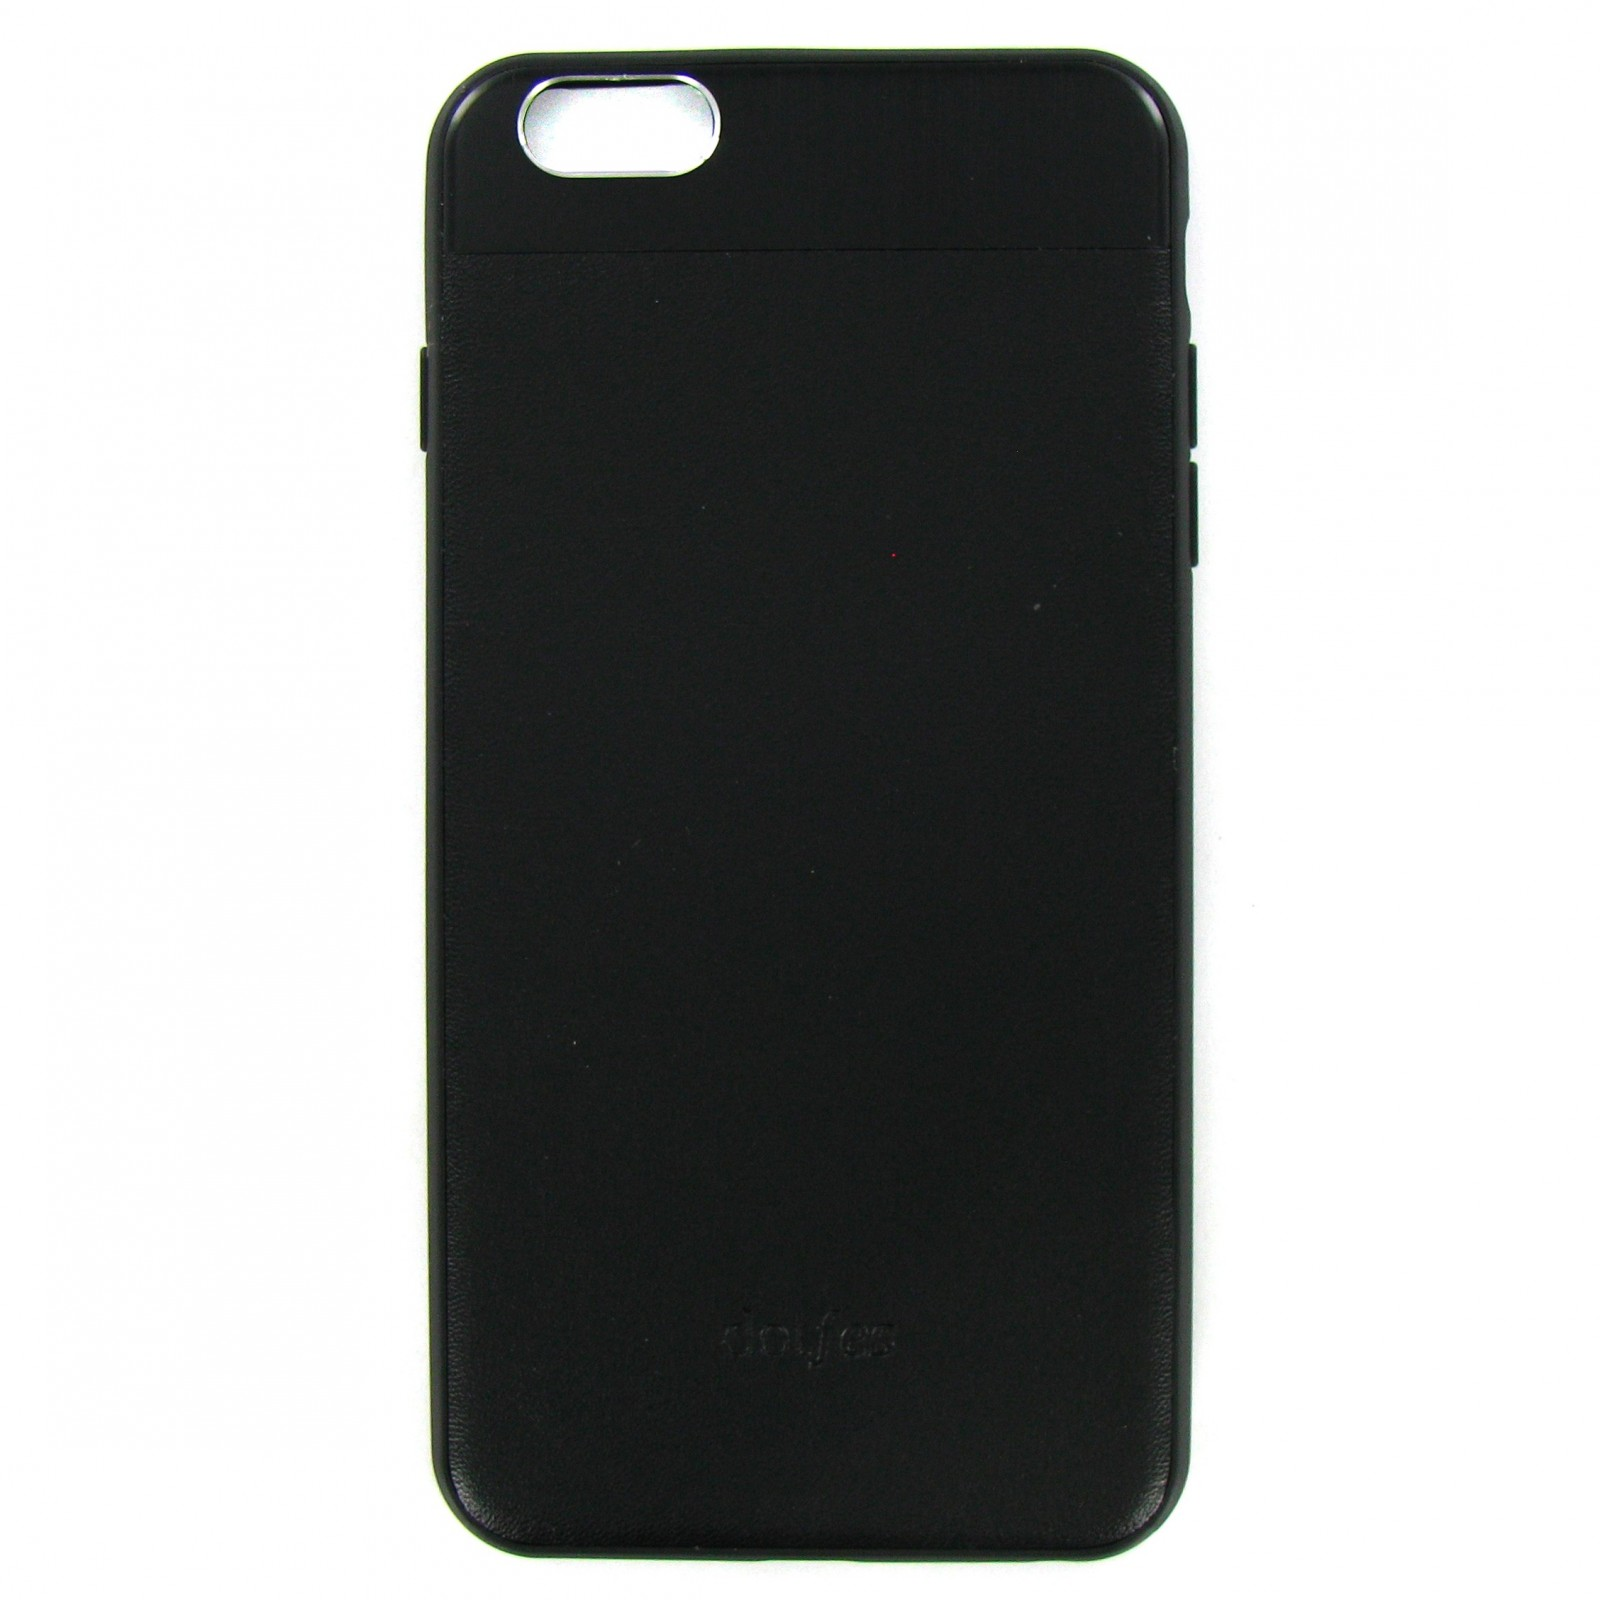 Накладка Dotfes G03 Aluminium Alloy Nappa leather Case для iPhone 6 Plus/6s Plus, black